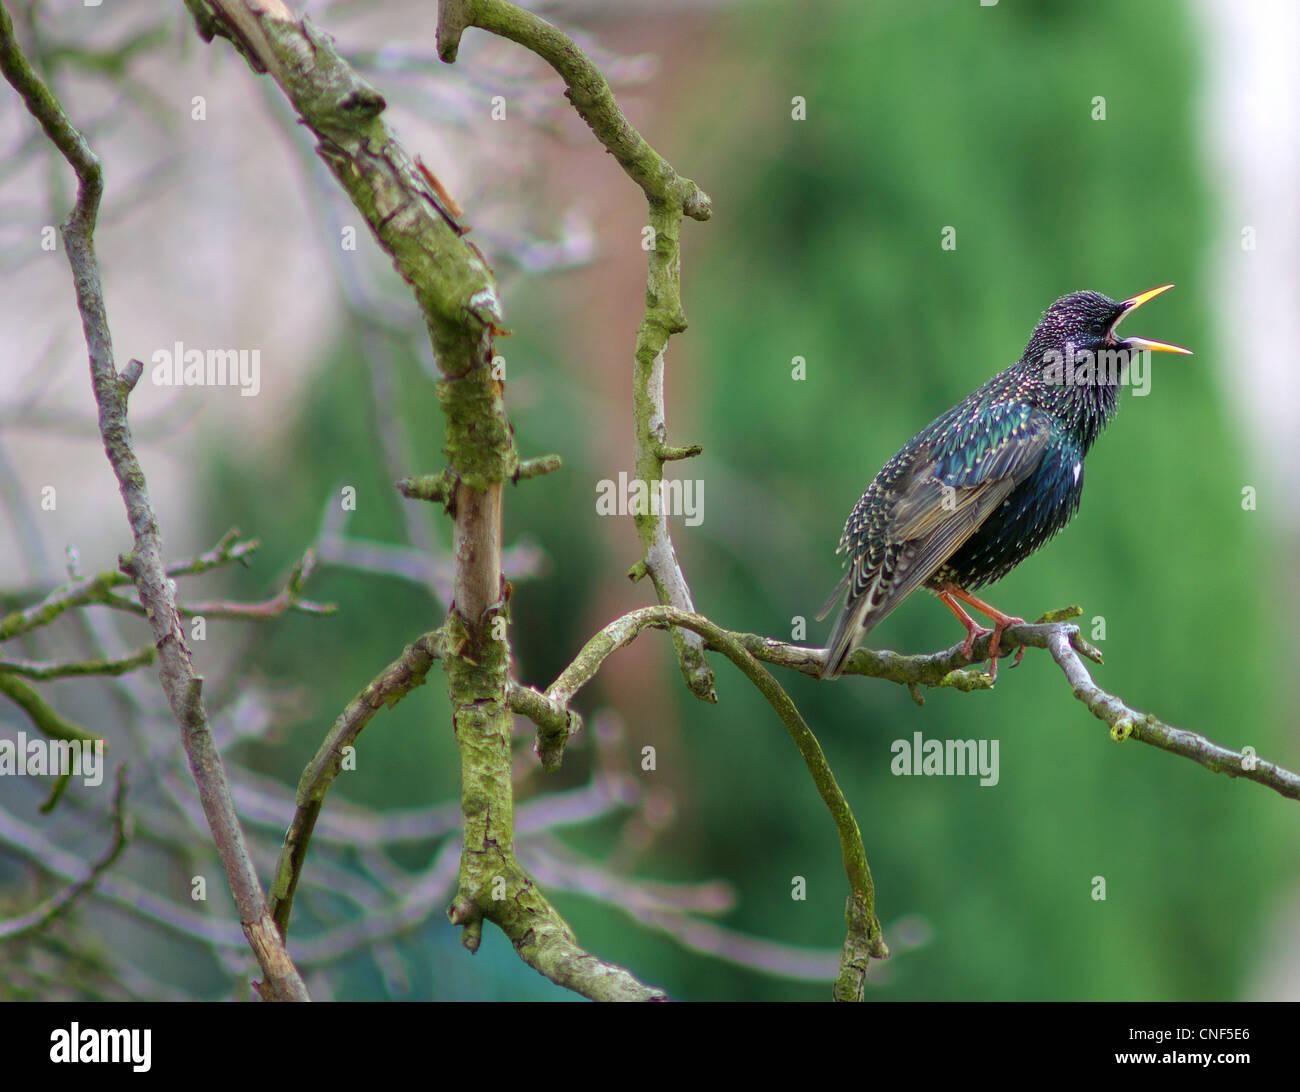 Starling bird singing on the branch Sturnus vulgaris - Stock Image